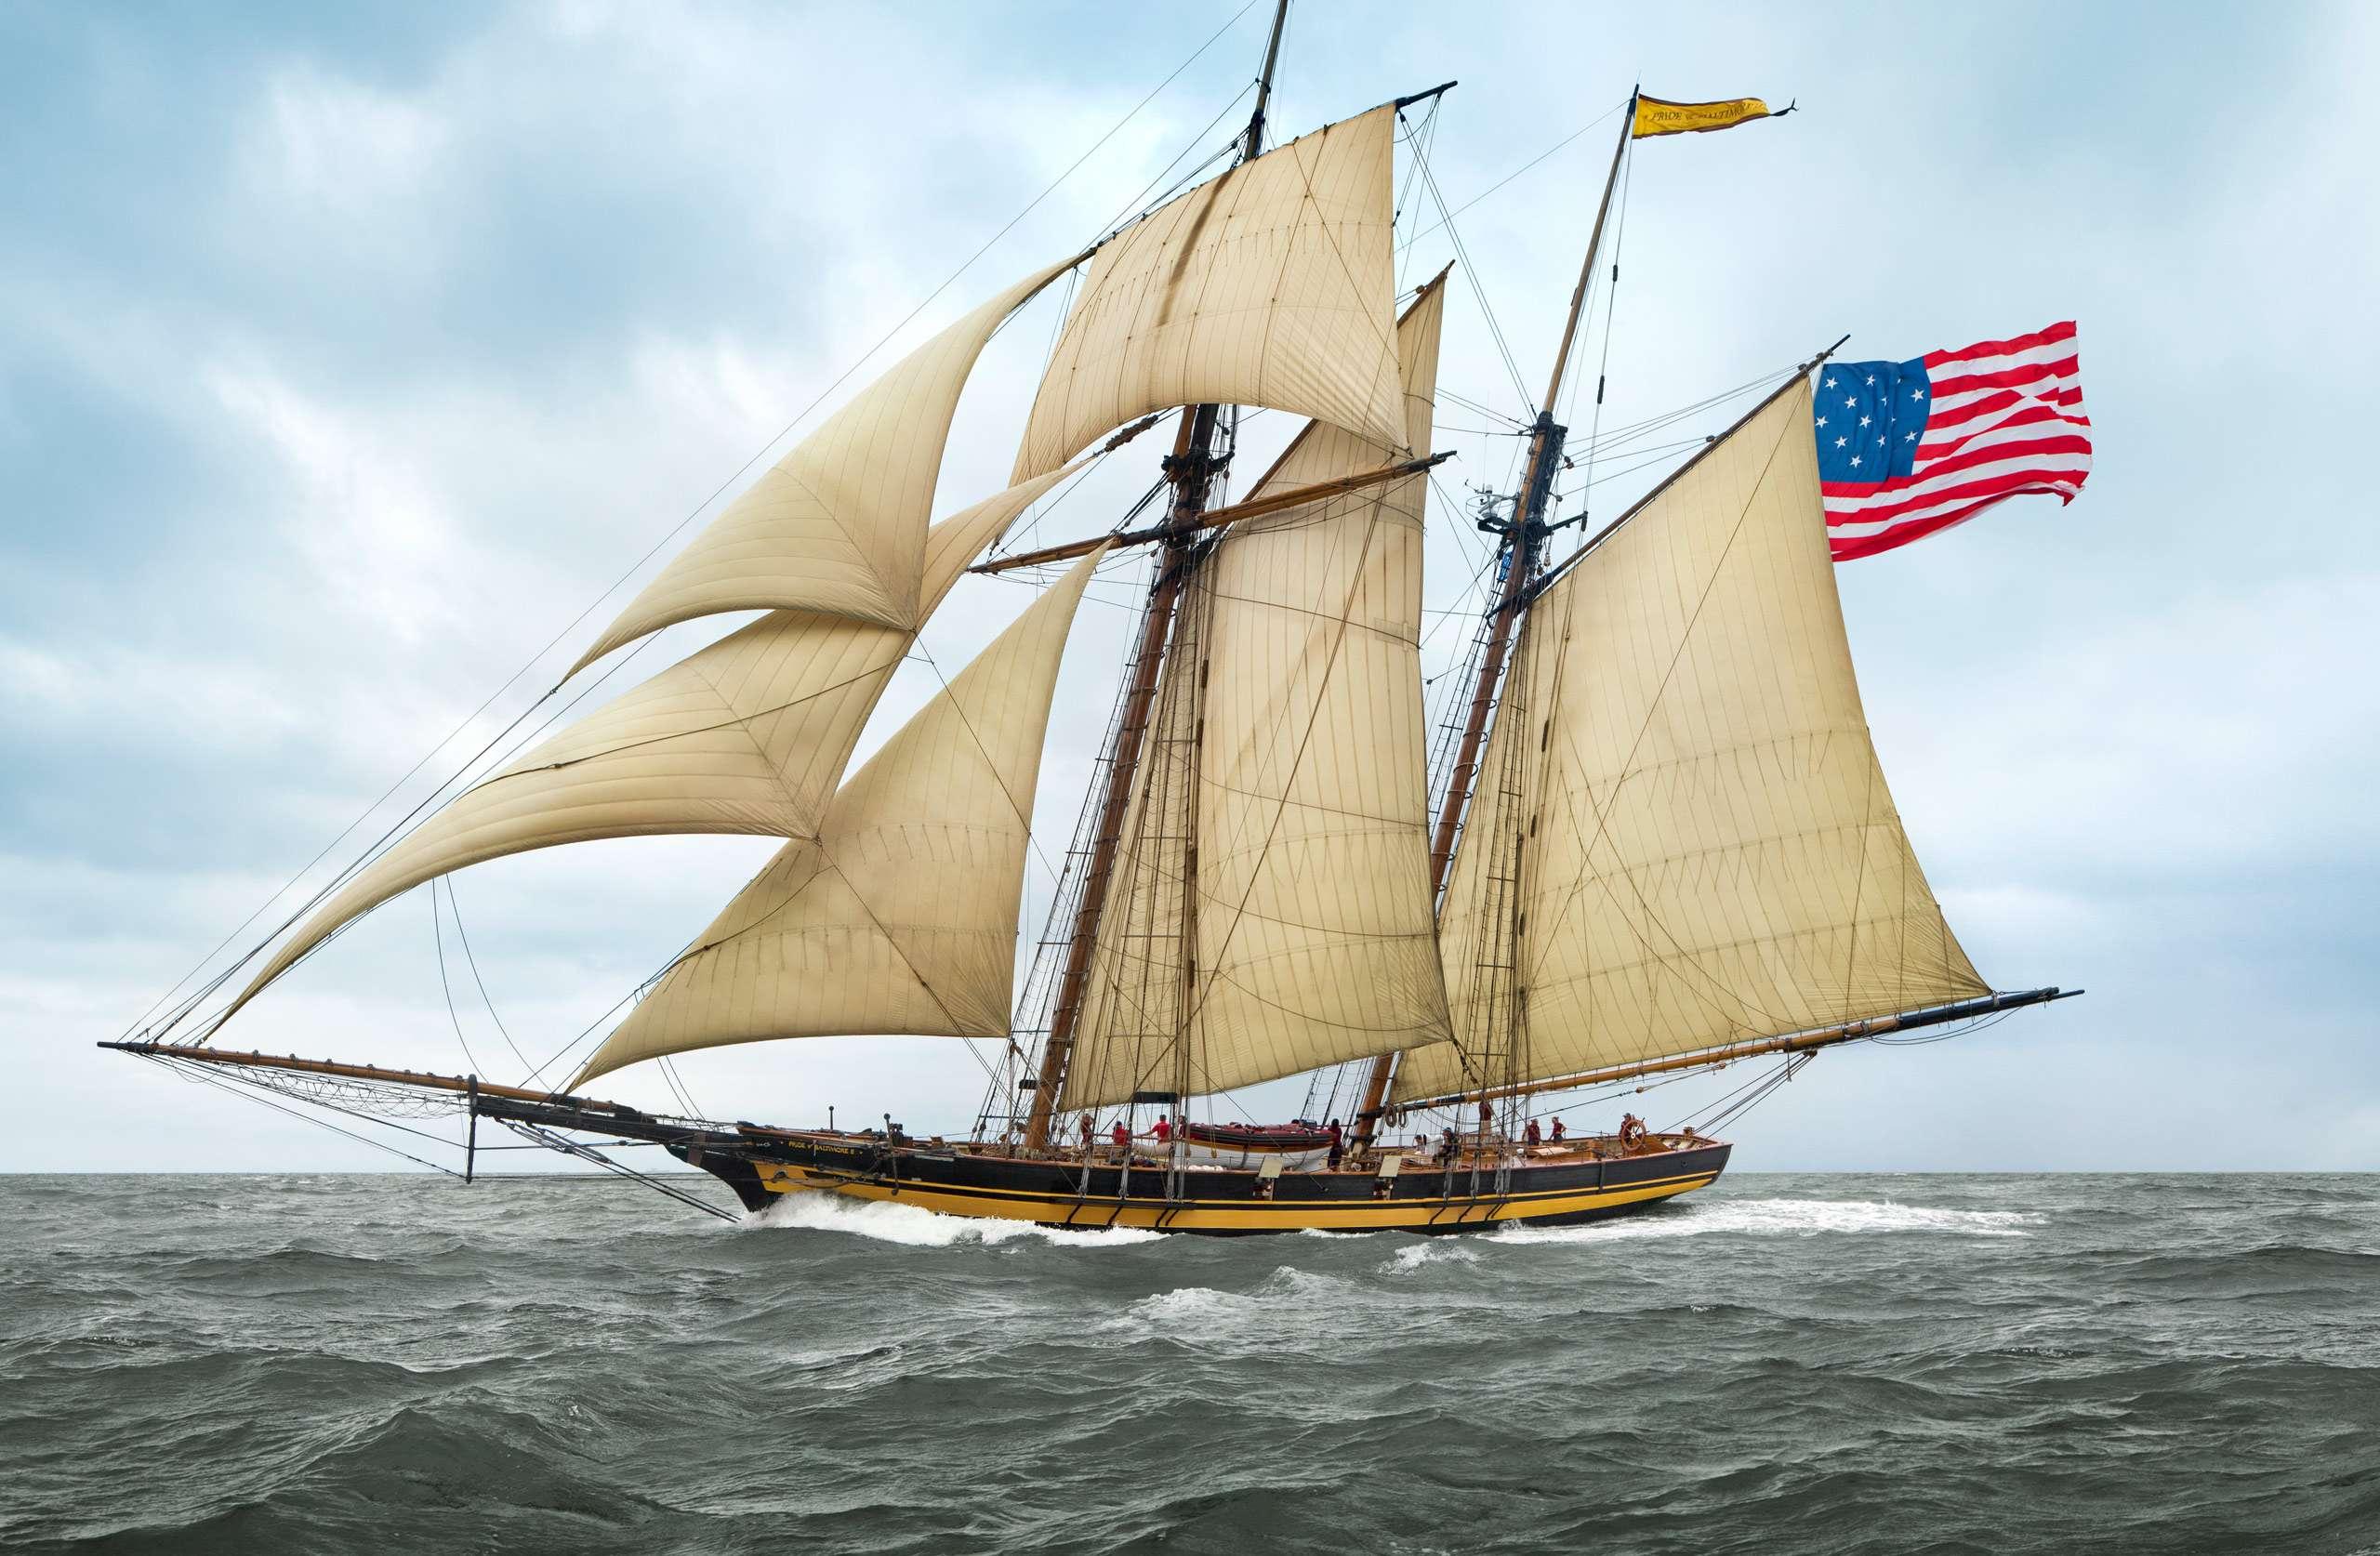 PORTFOLIO - Sailing - Windjammers #2   PCG683